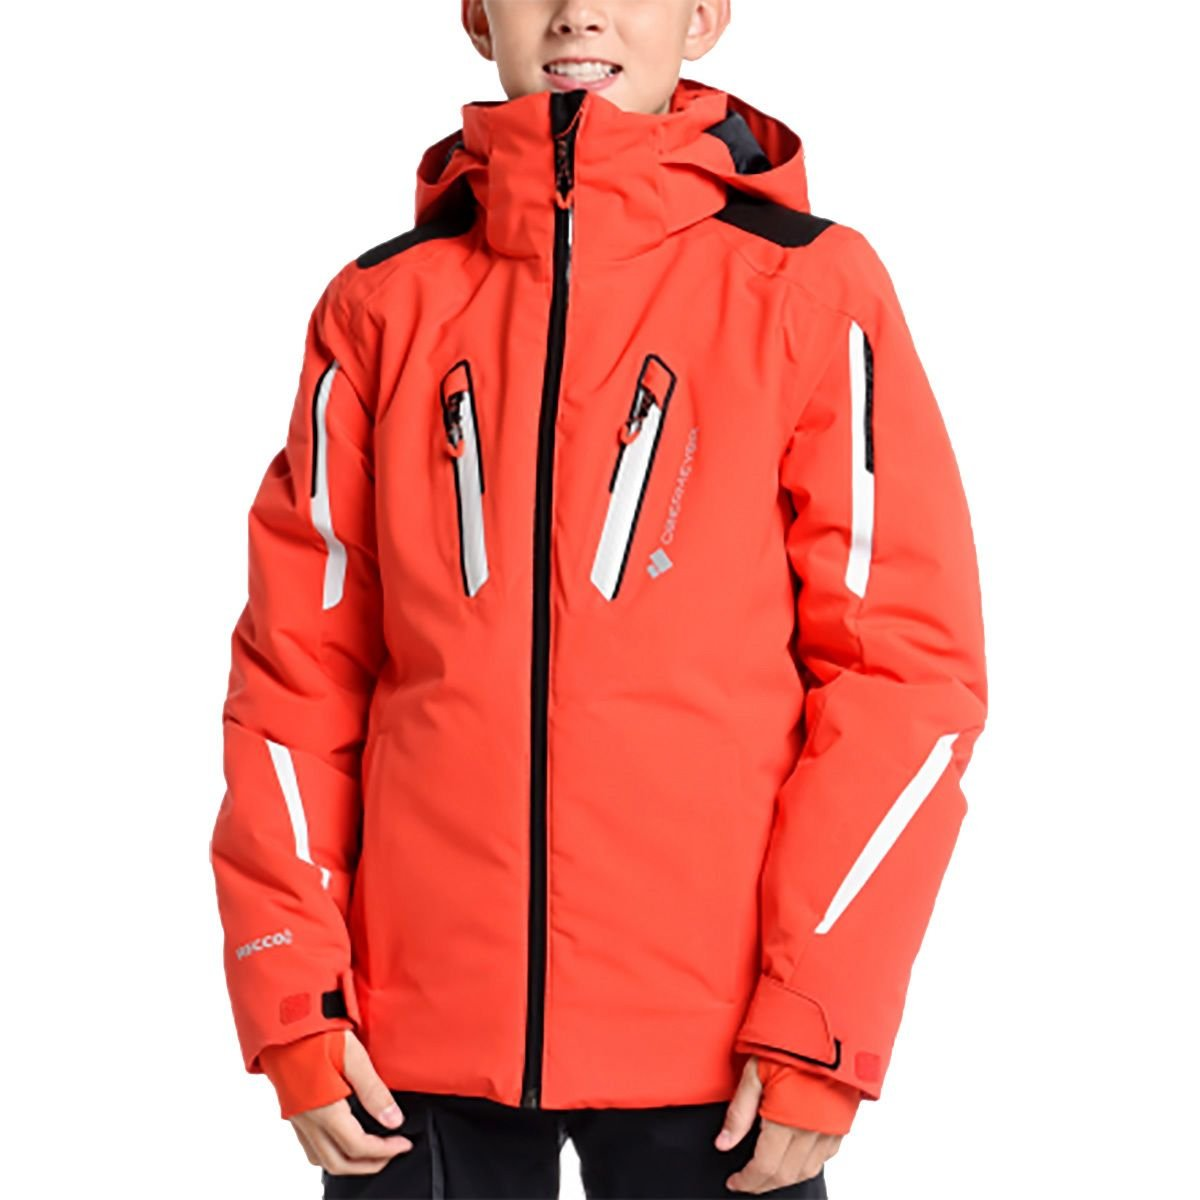 Obermeyer Kids Boy's Mach 8 Jacket (Little Kids/Big Kids) Red Medium by Obermeyer Kids